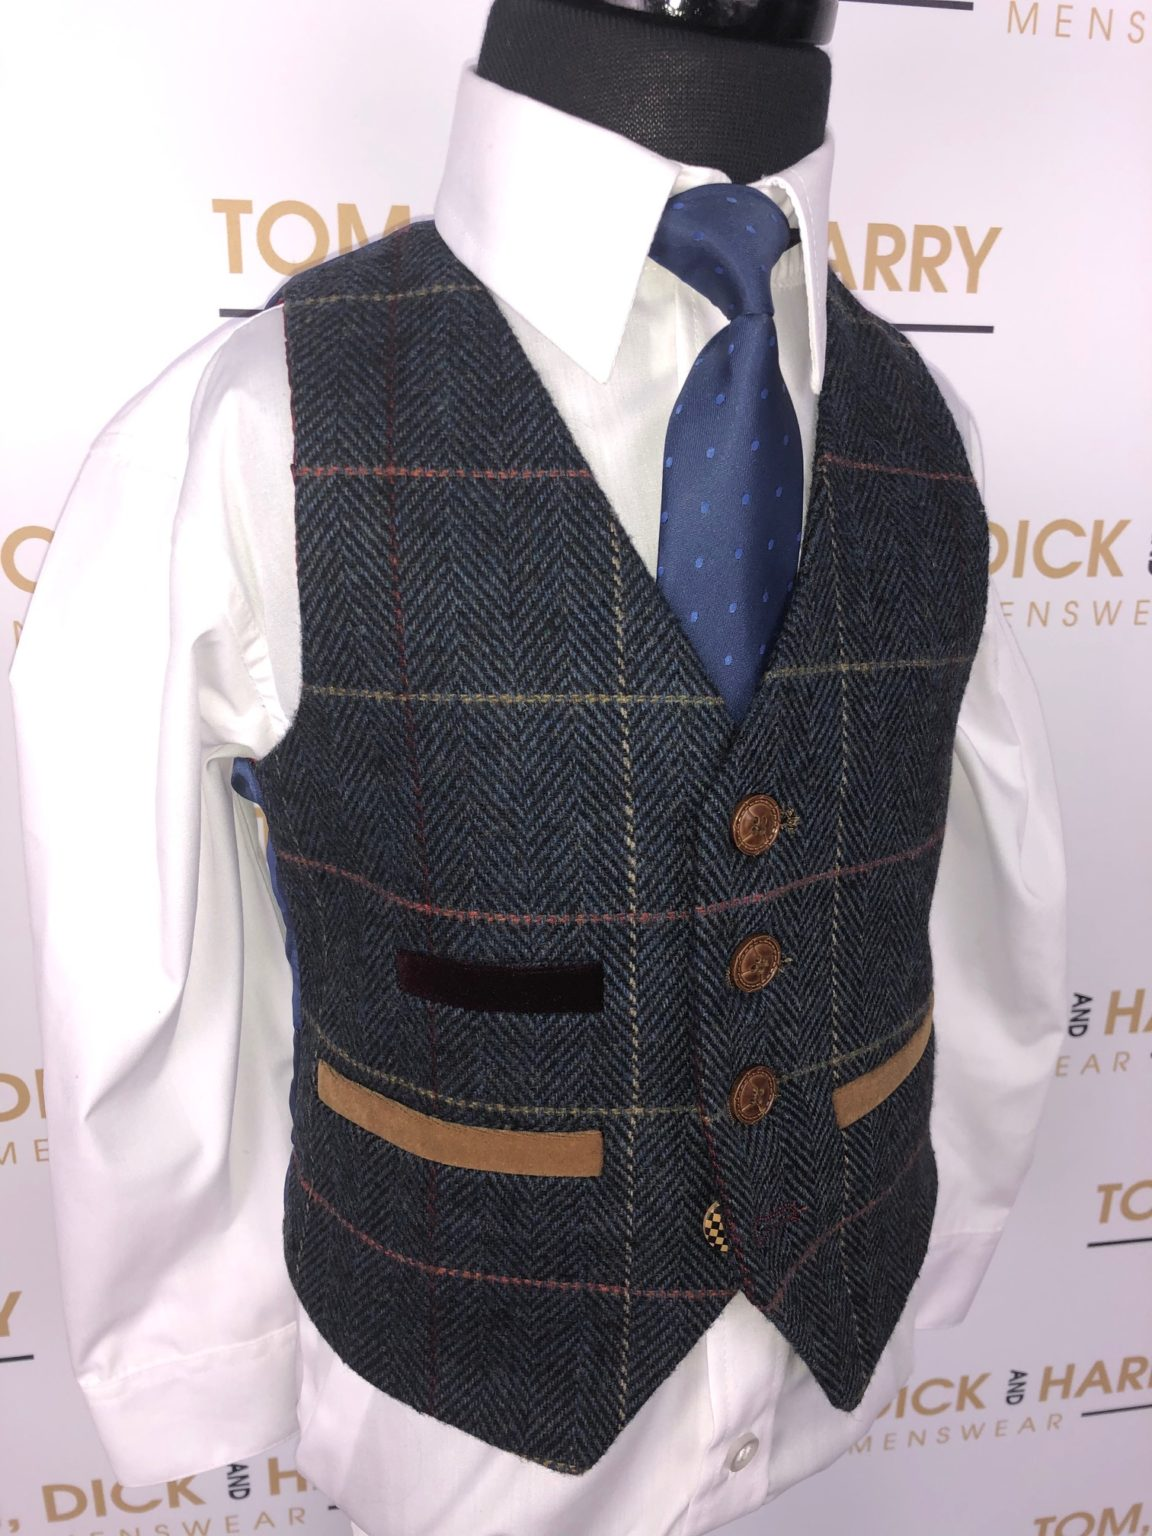 Marc Darcy - ETON - Childrens Navy Blue Tweed Check Three Piece Suit